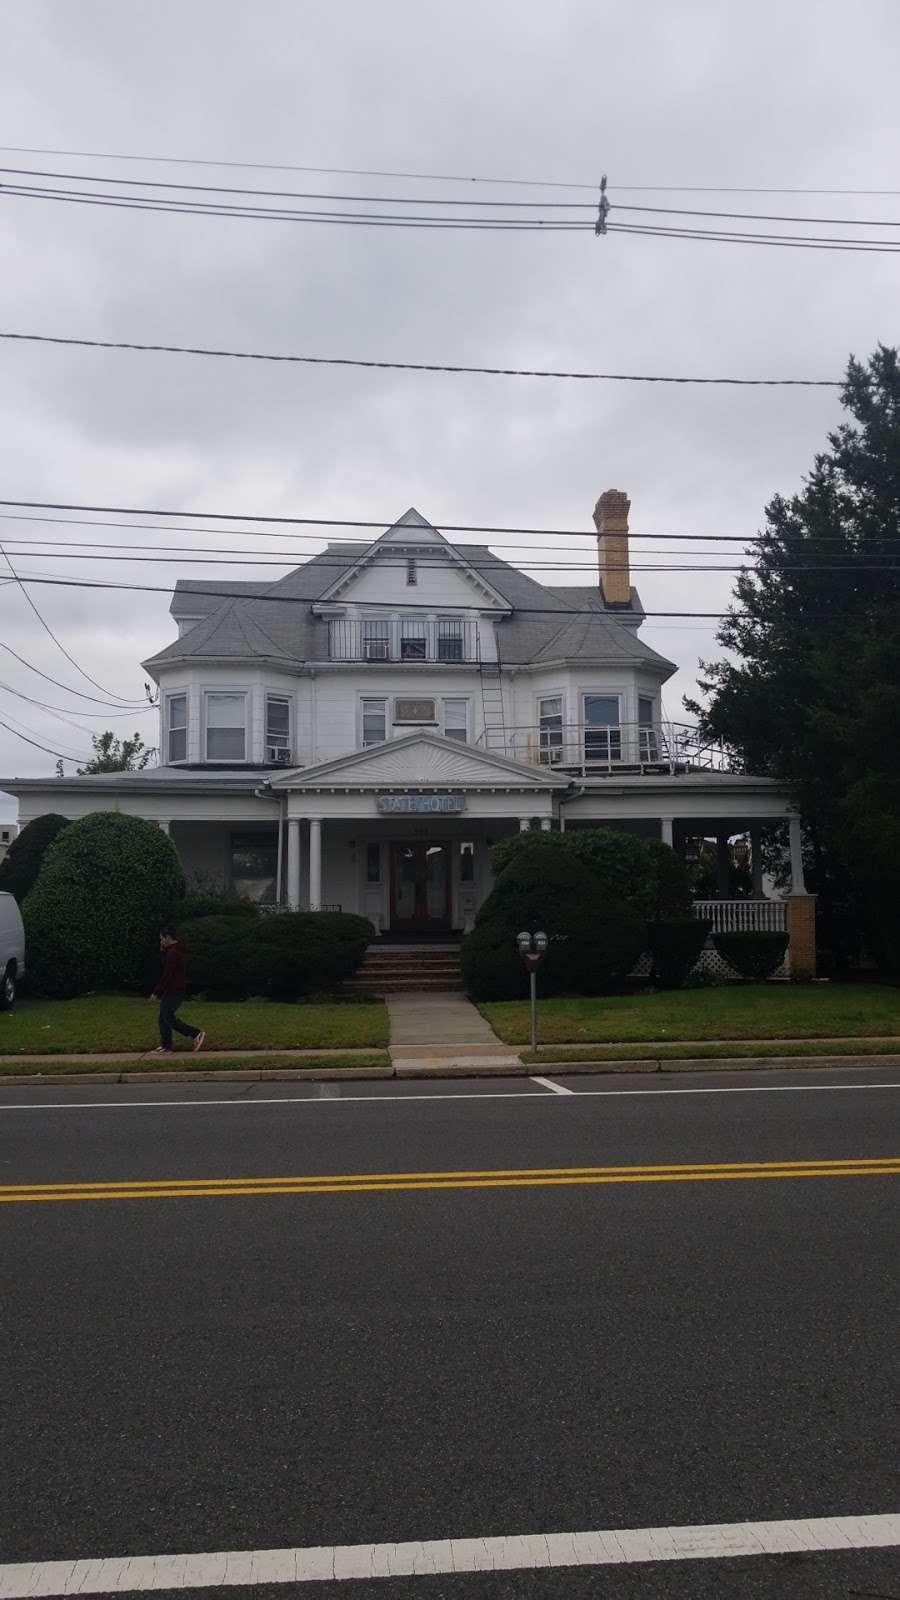 State Hotel - lodging  | Photo 2 of 2 | Address: 288 State St, Hackensack, NJ 07601, USA | Phone: (201) 343-4615